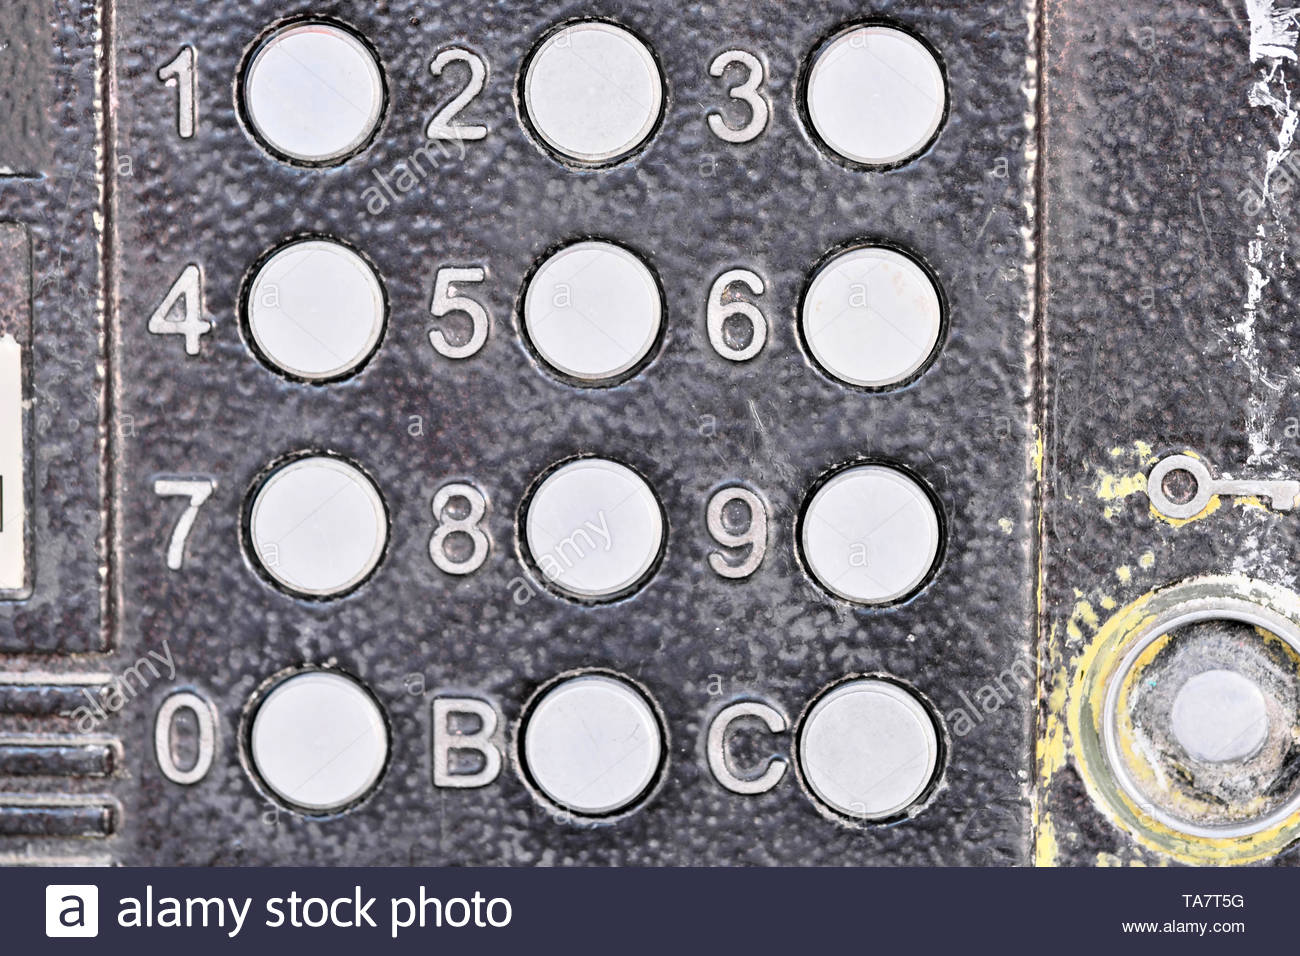 Panel doorphone dialing access code to open the entrance door of an urban apartment building close-up macro - Stock Image